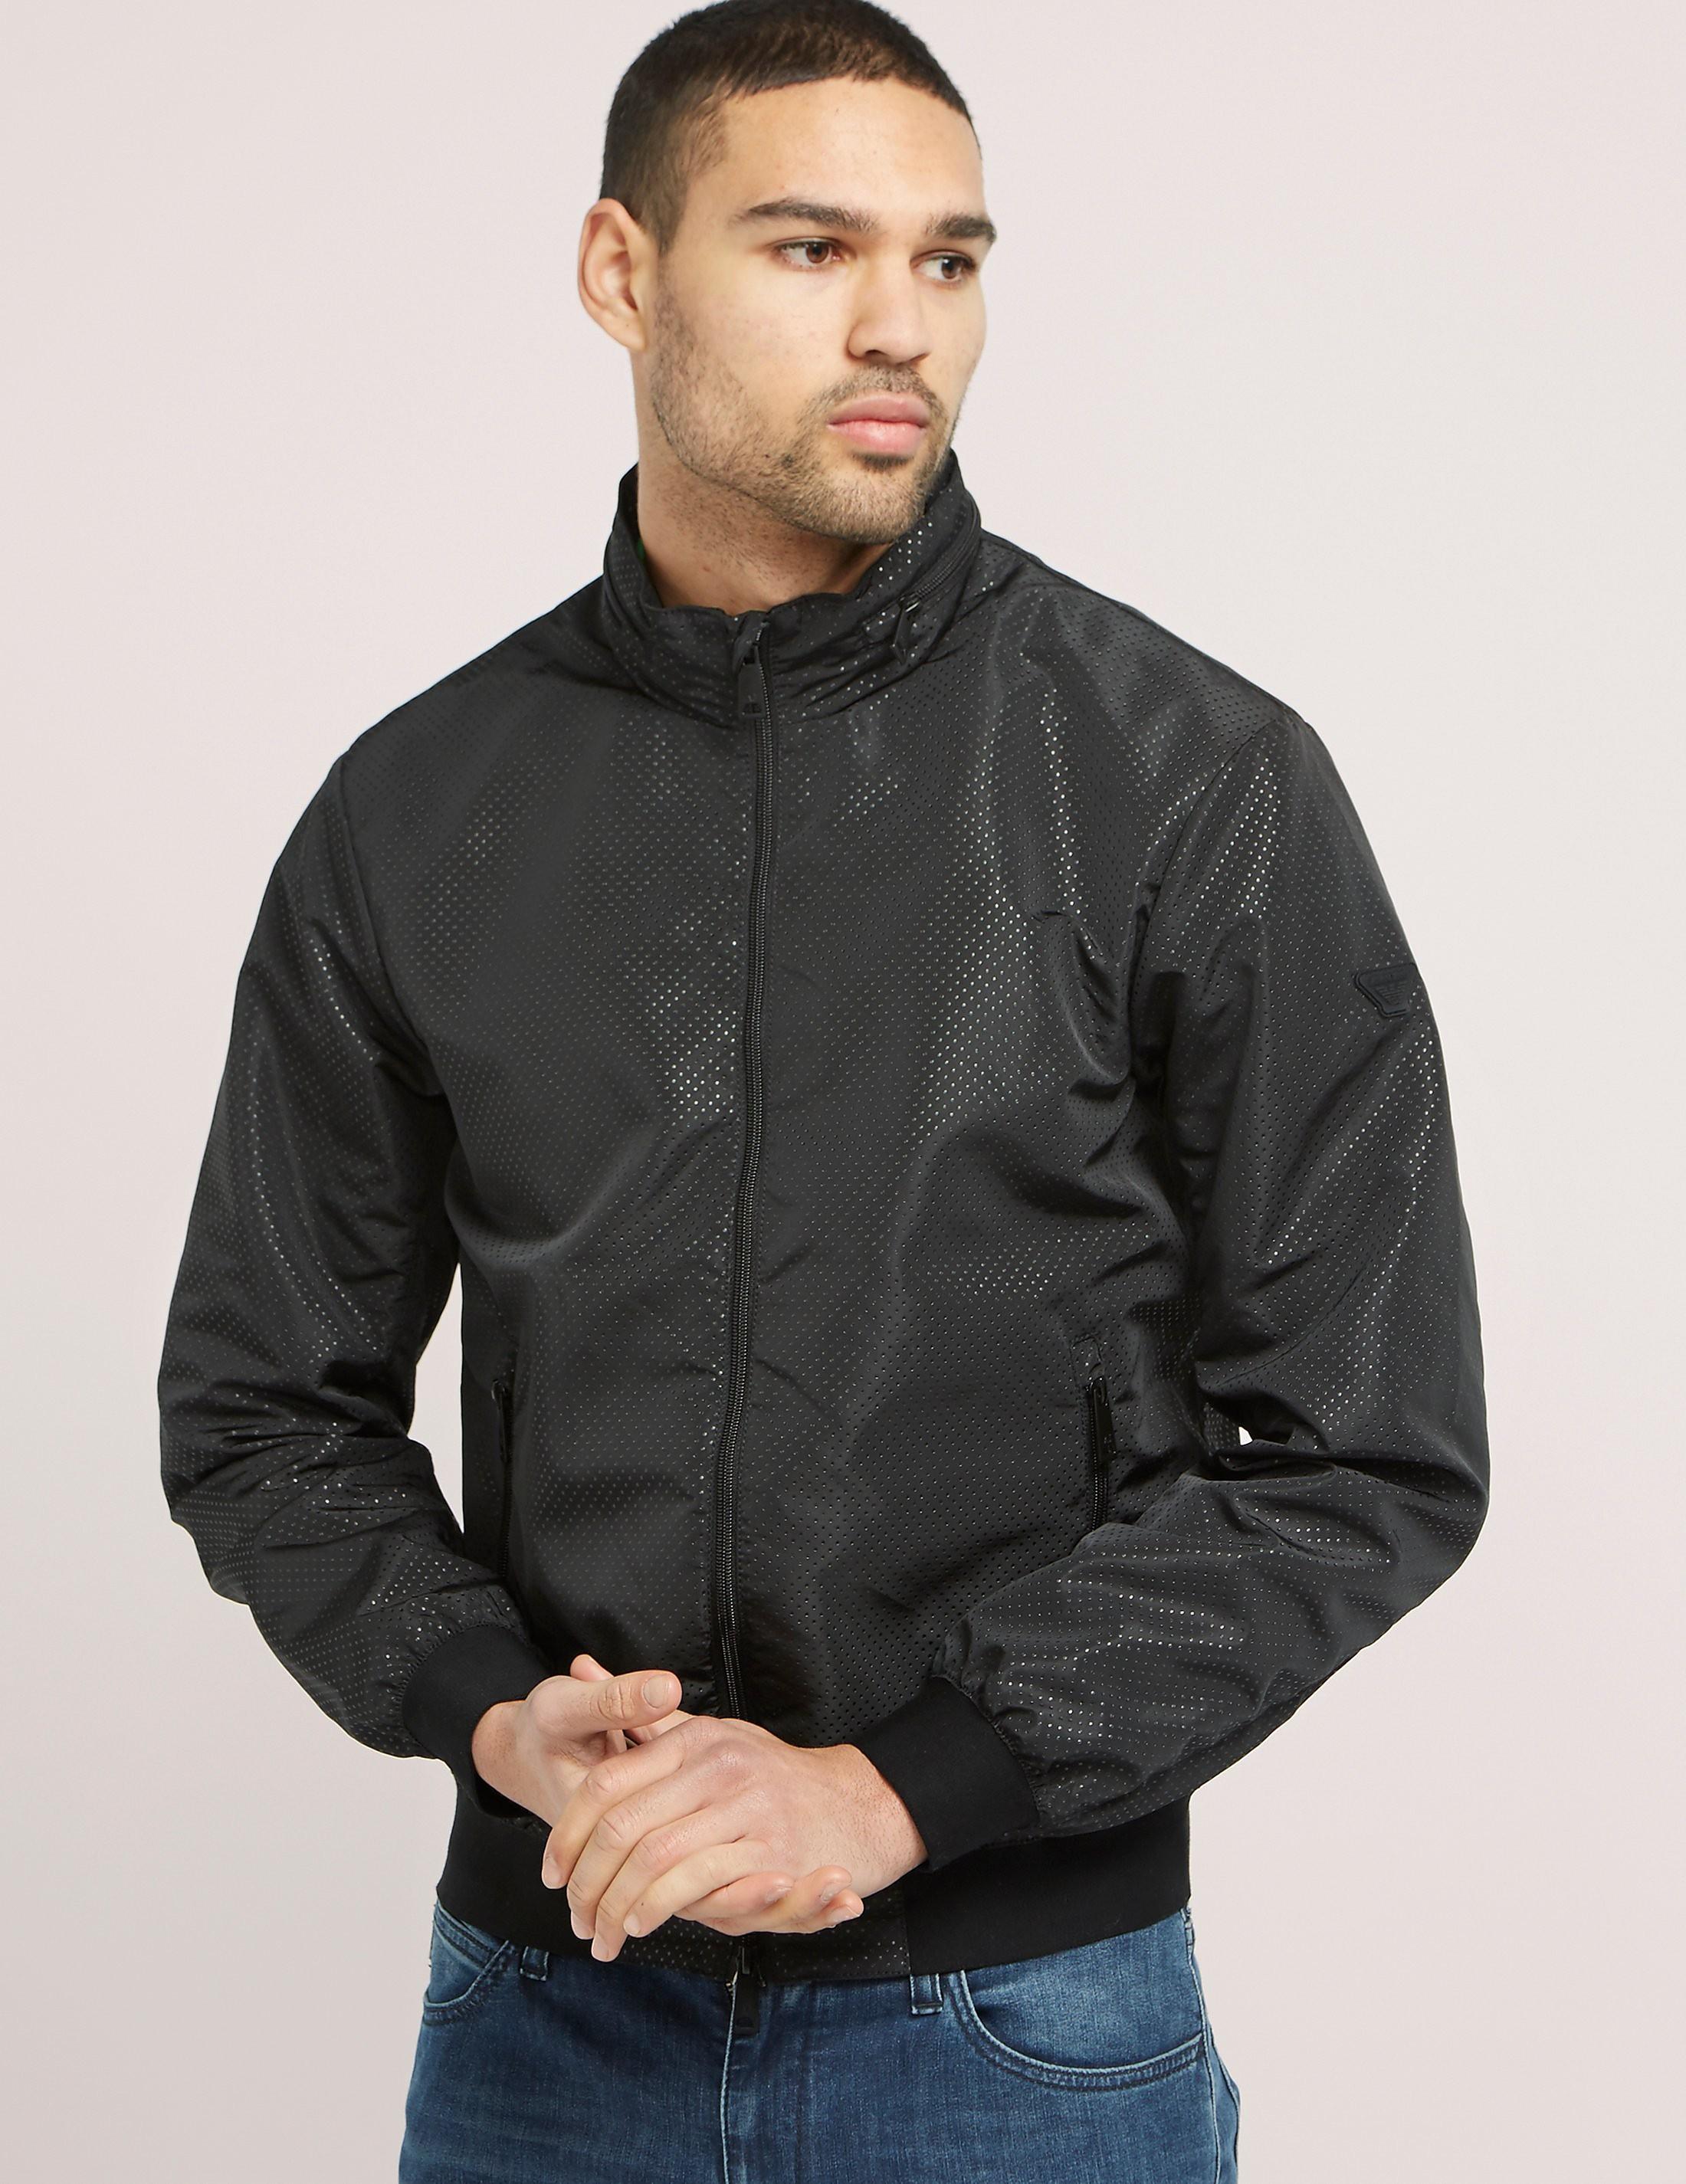 Armani Jeans Bomber Jacket